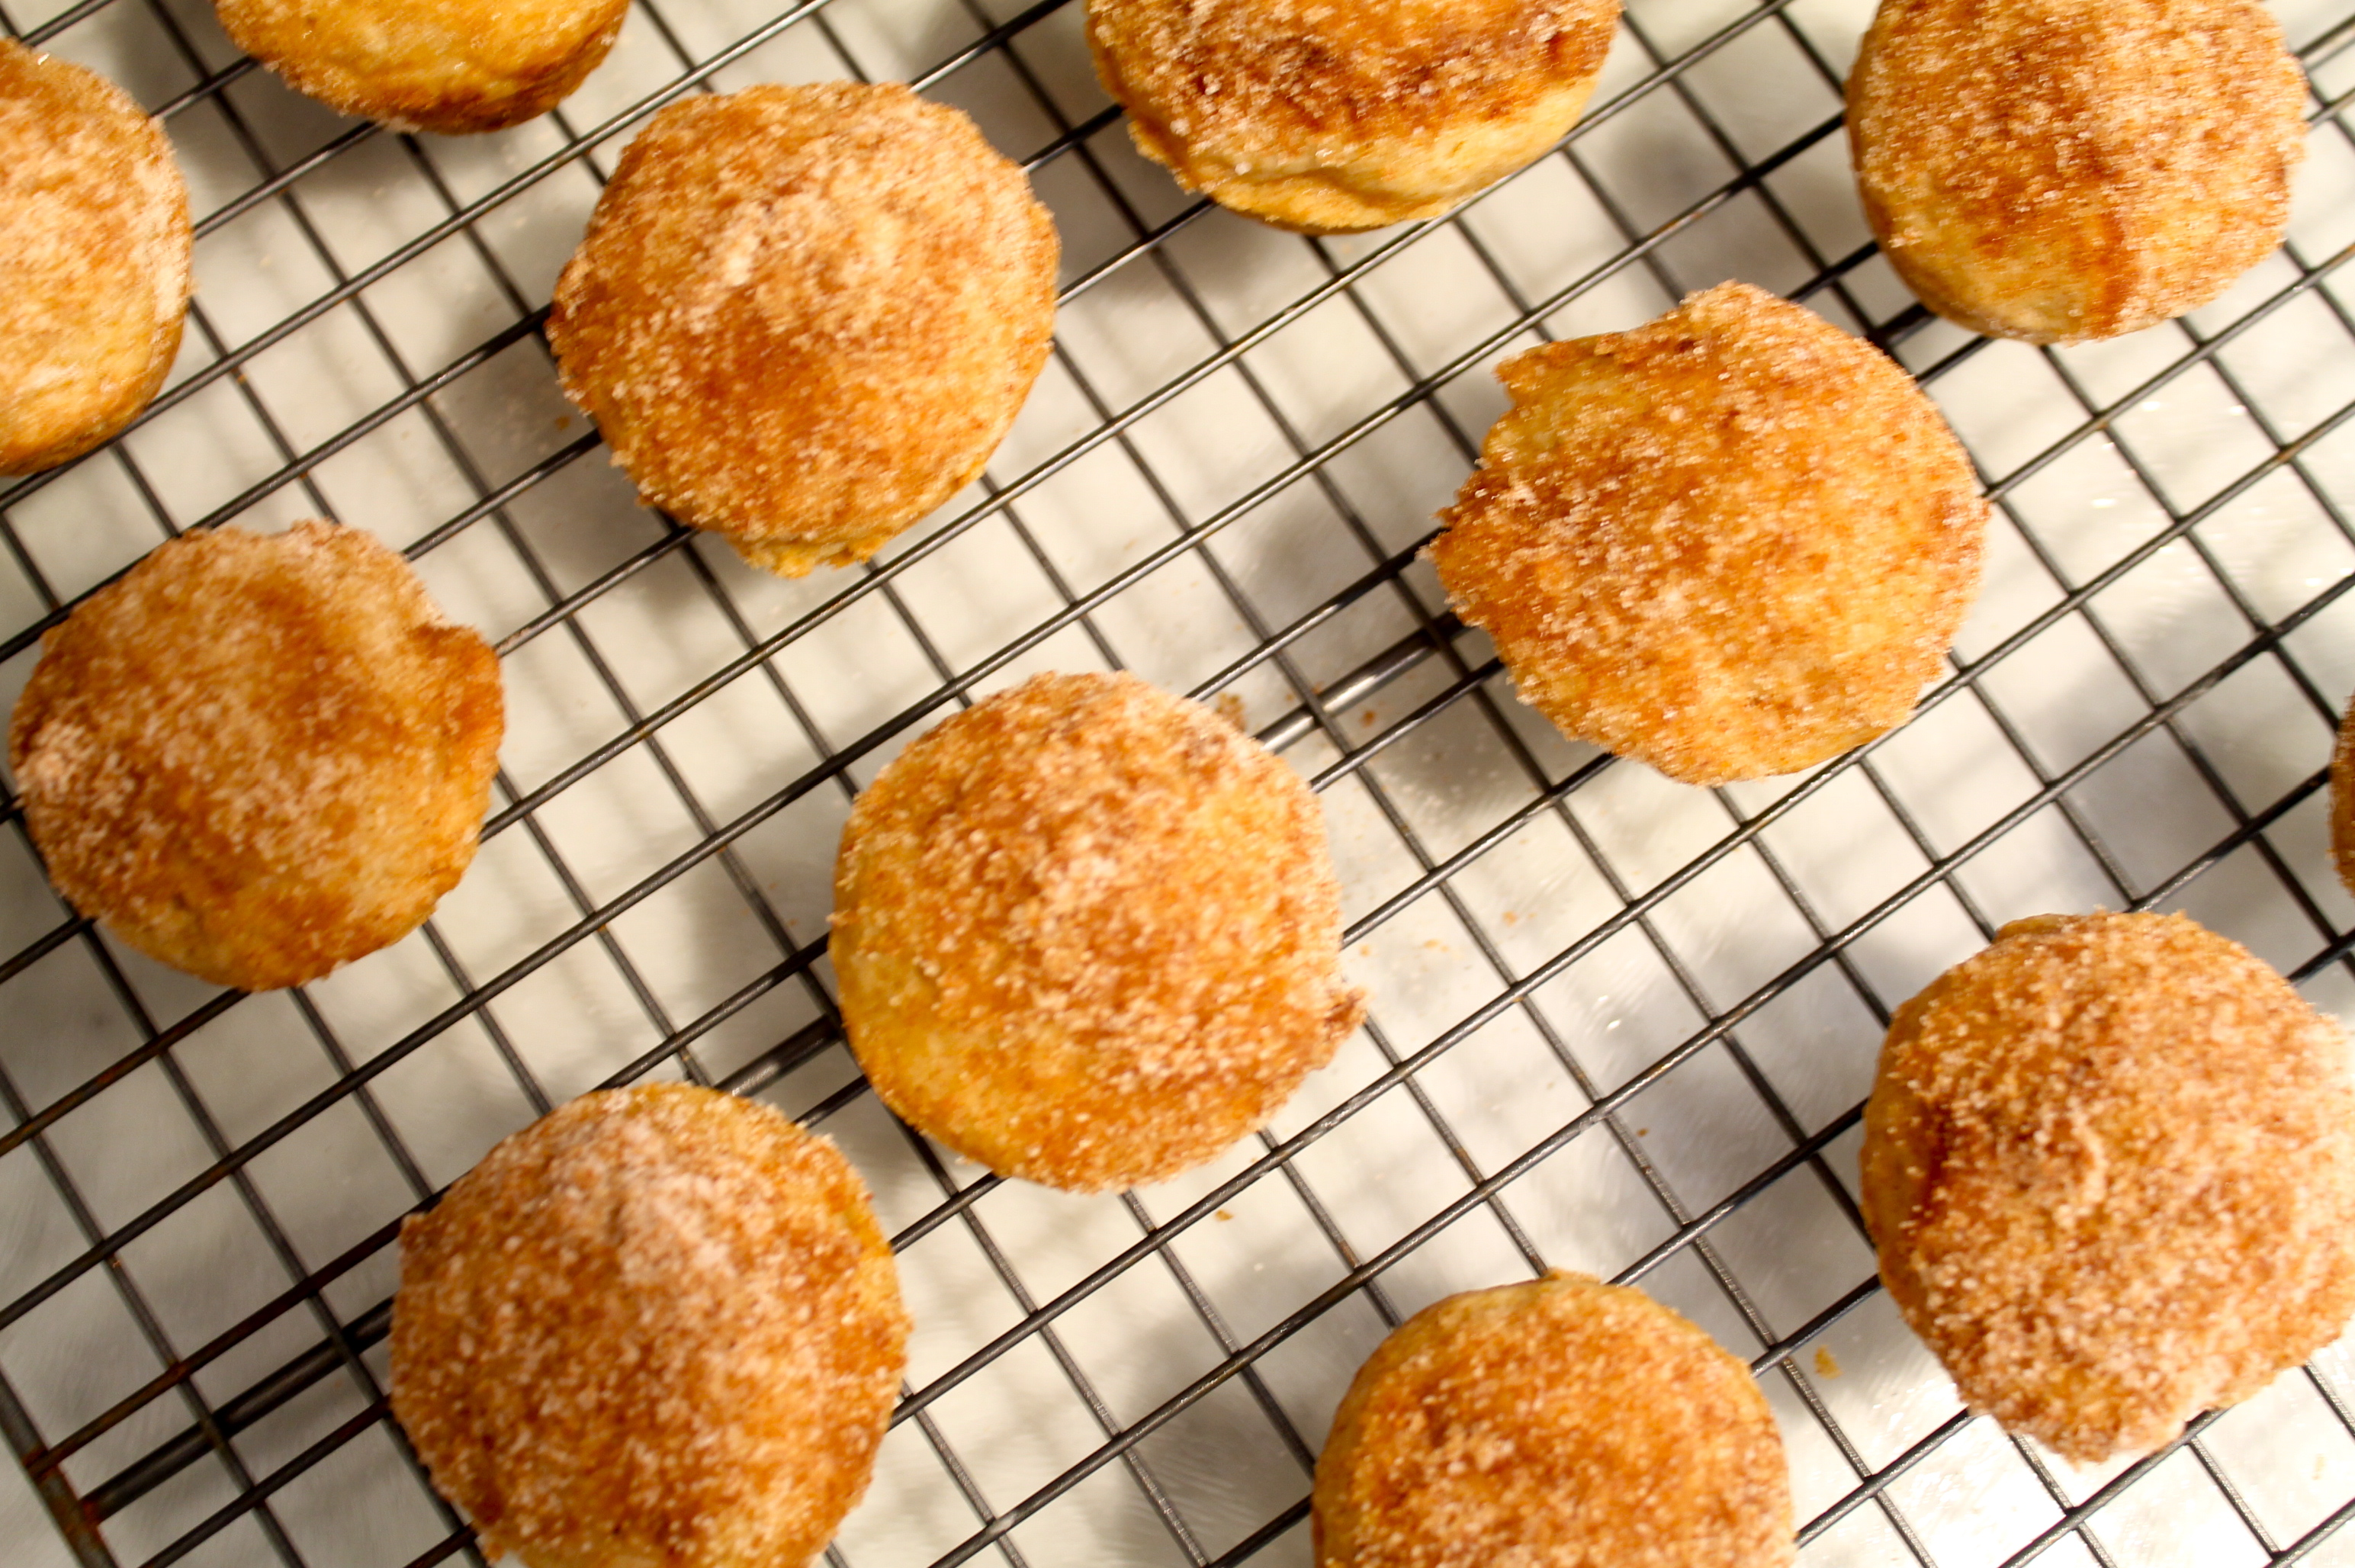 IMG 6200 - Mini-Applesauce Muffins